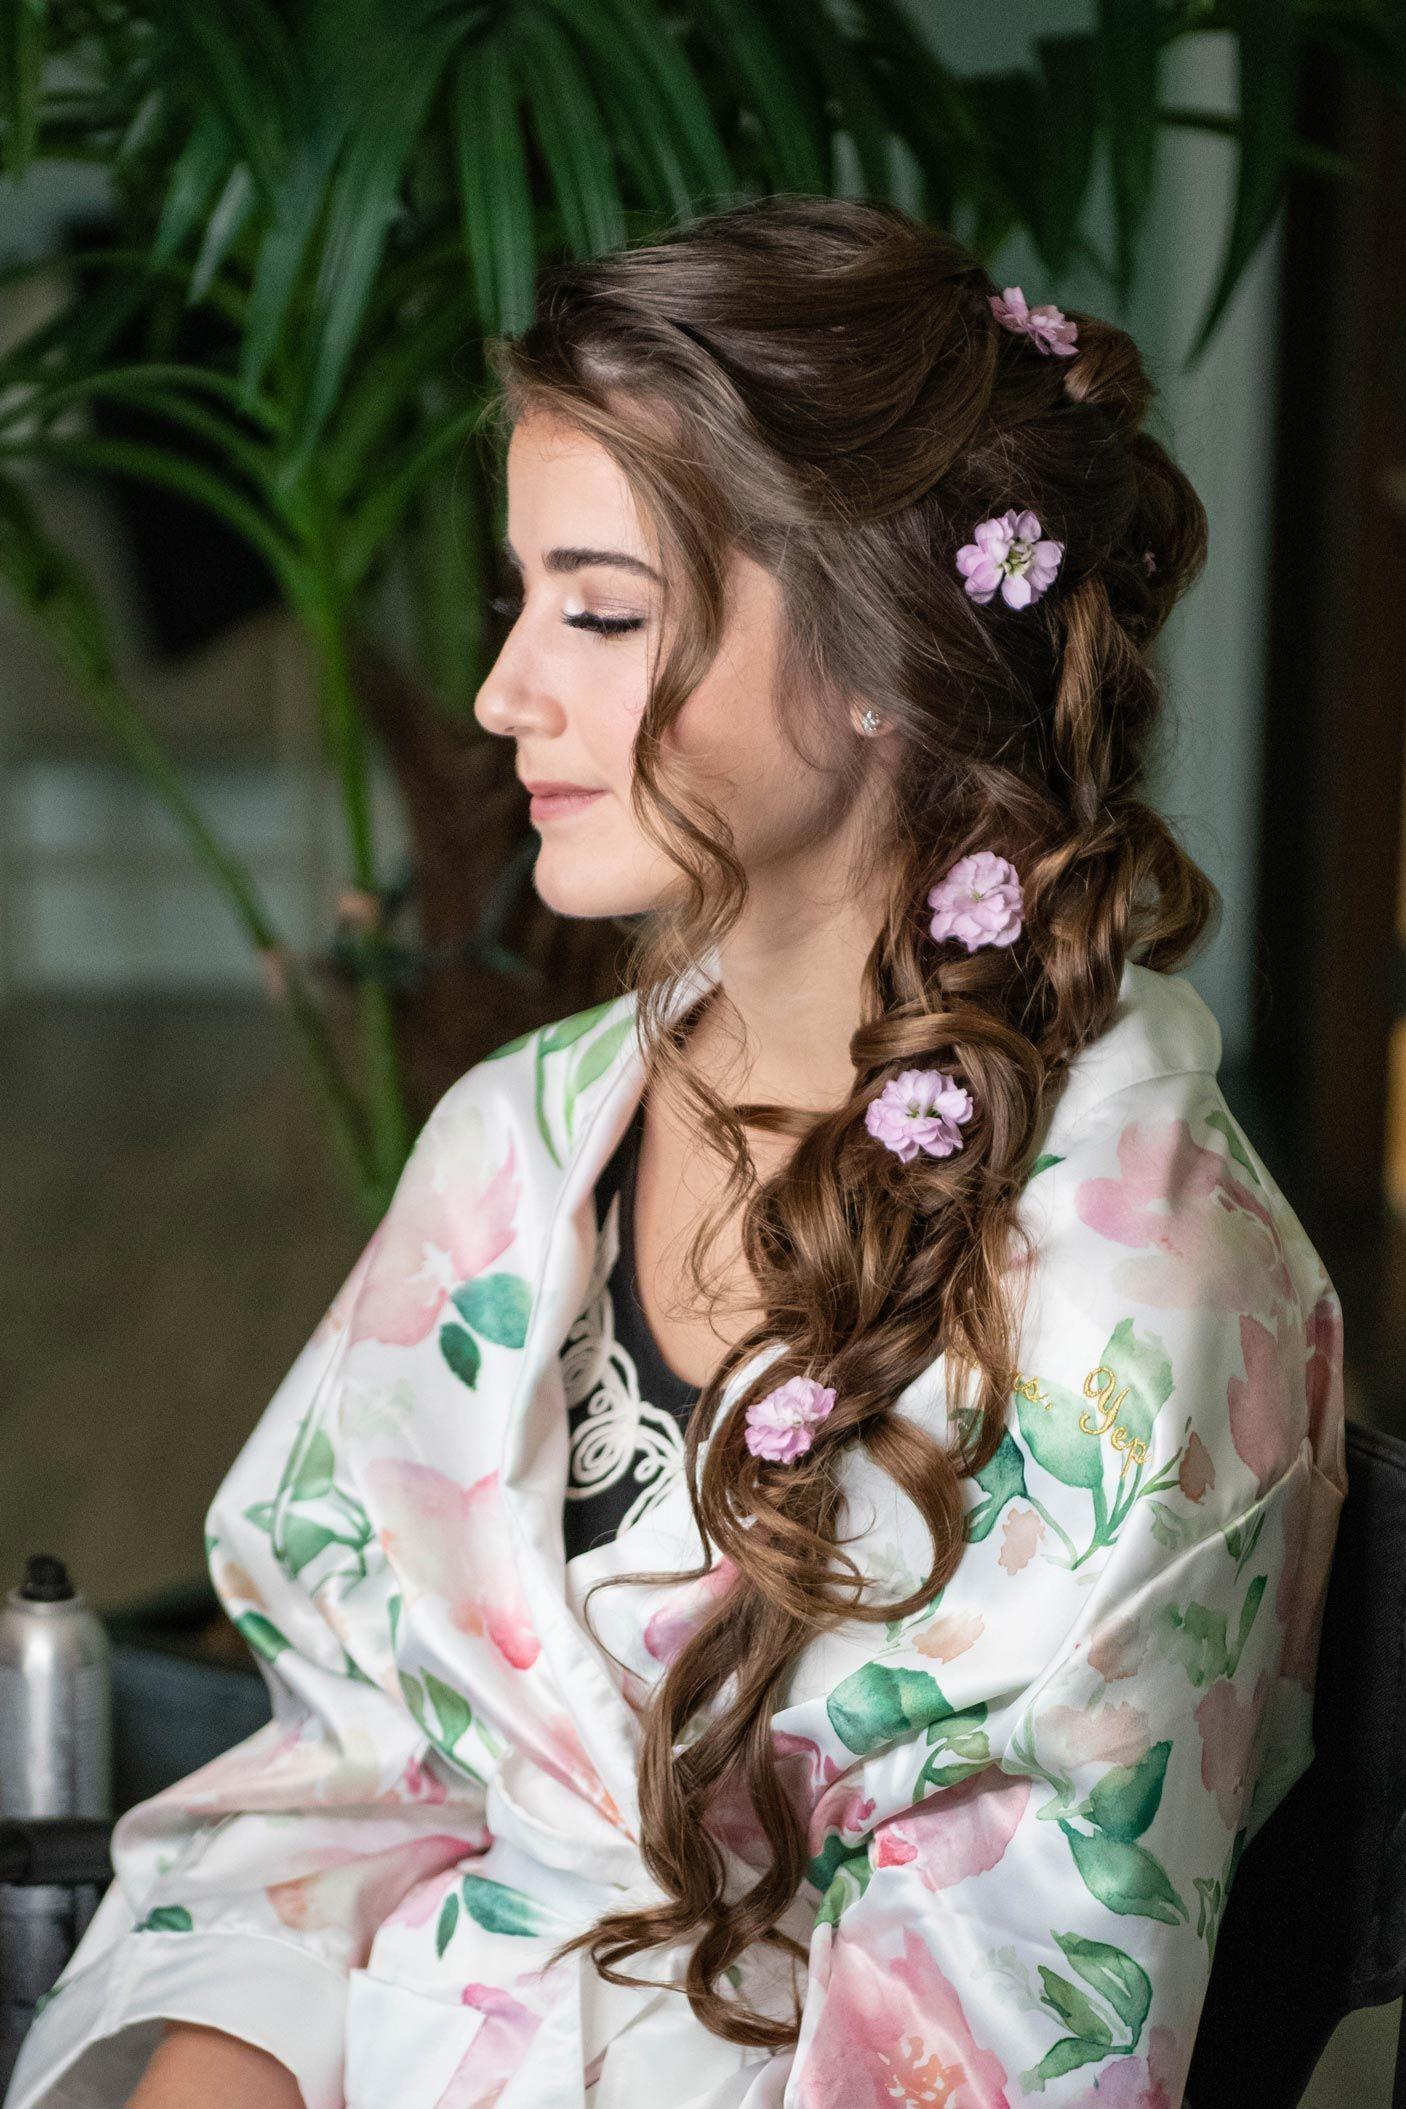 bridal hair stylist in 2019 | naples wedding, bridal hair